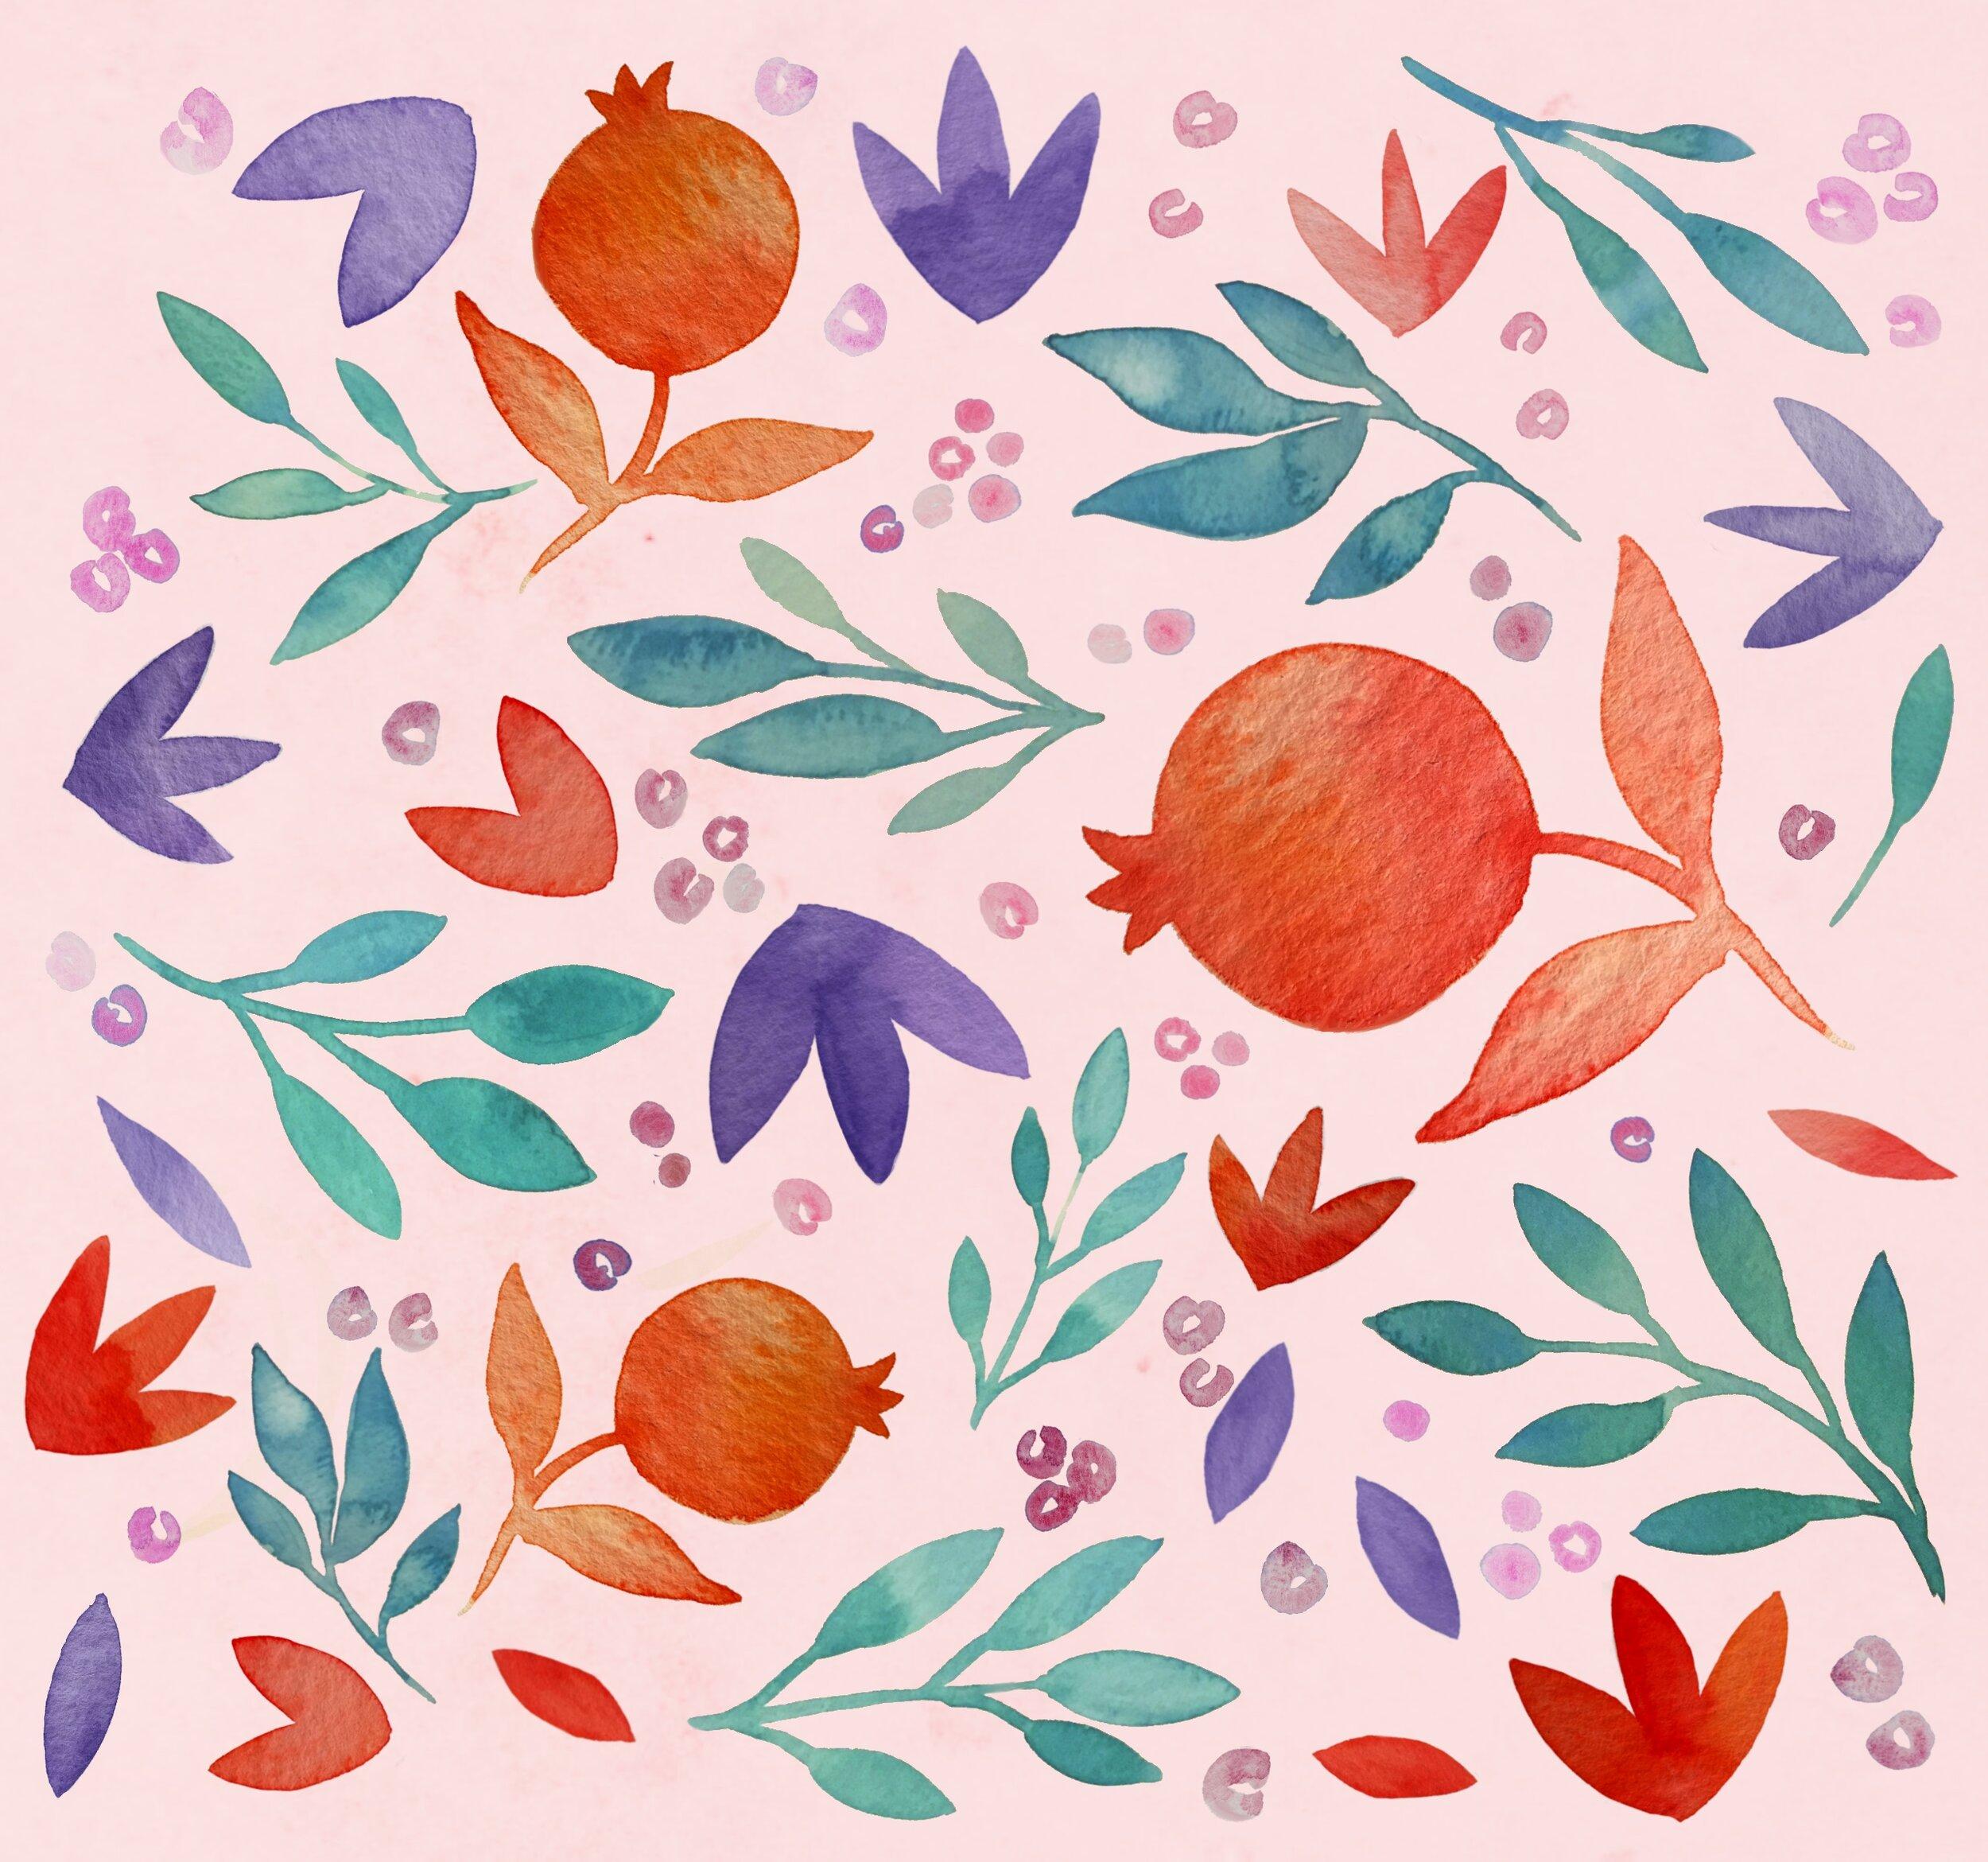 pomegranate-pattern-MariaOver.JPG